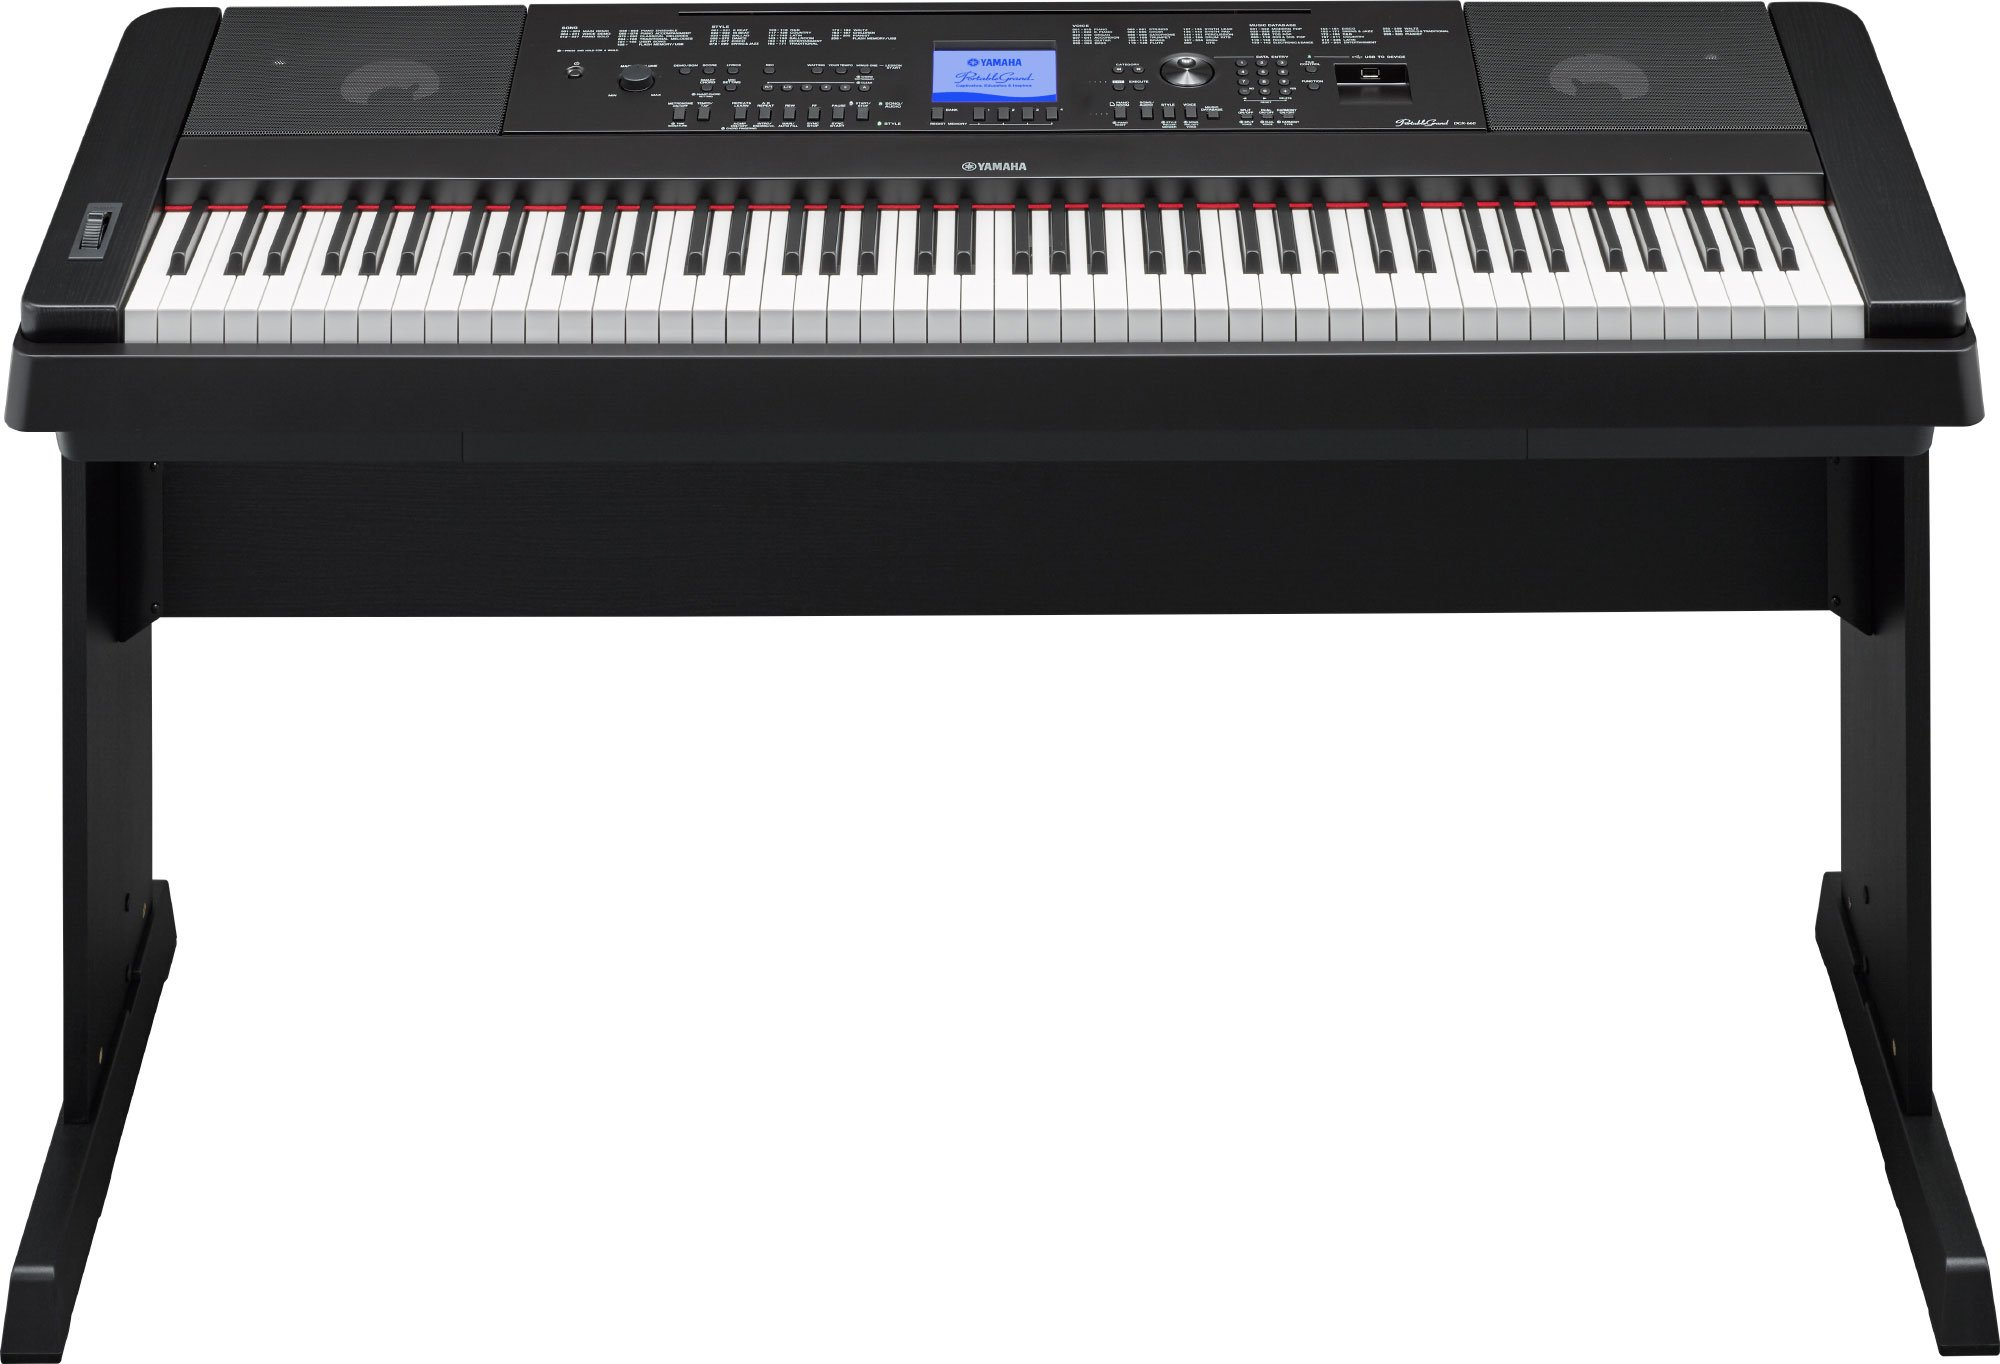 Casio PX 860 Vs. Yamaha DGX 660